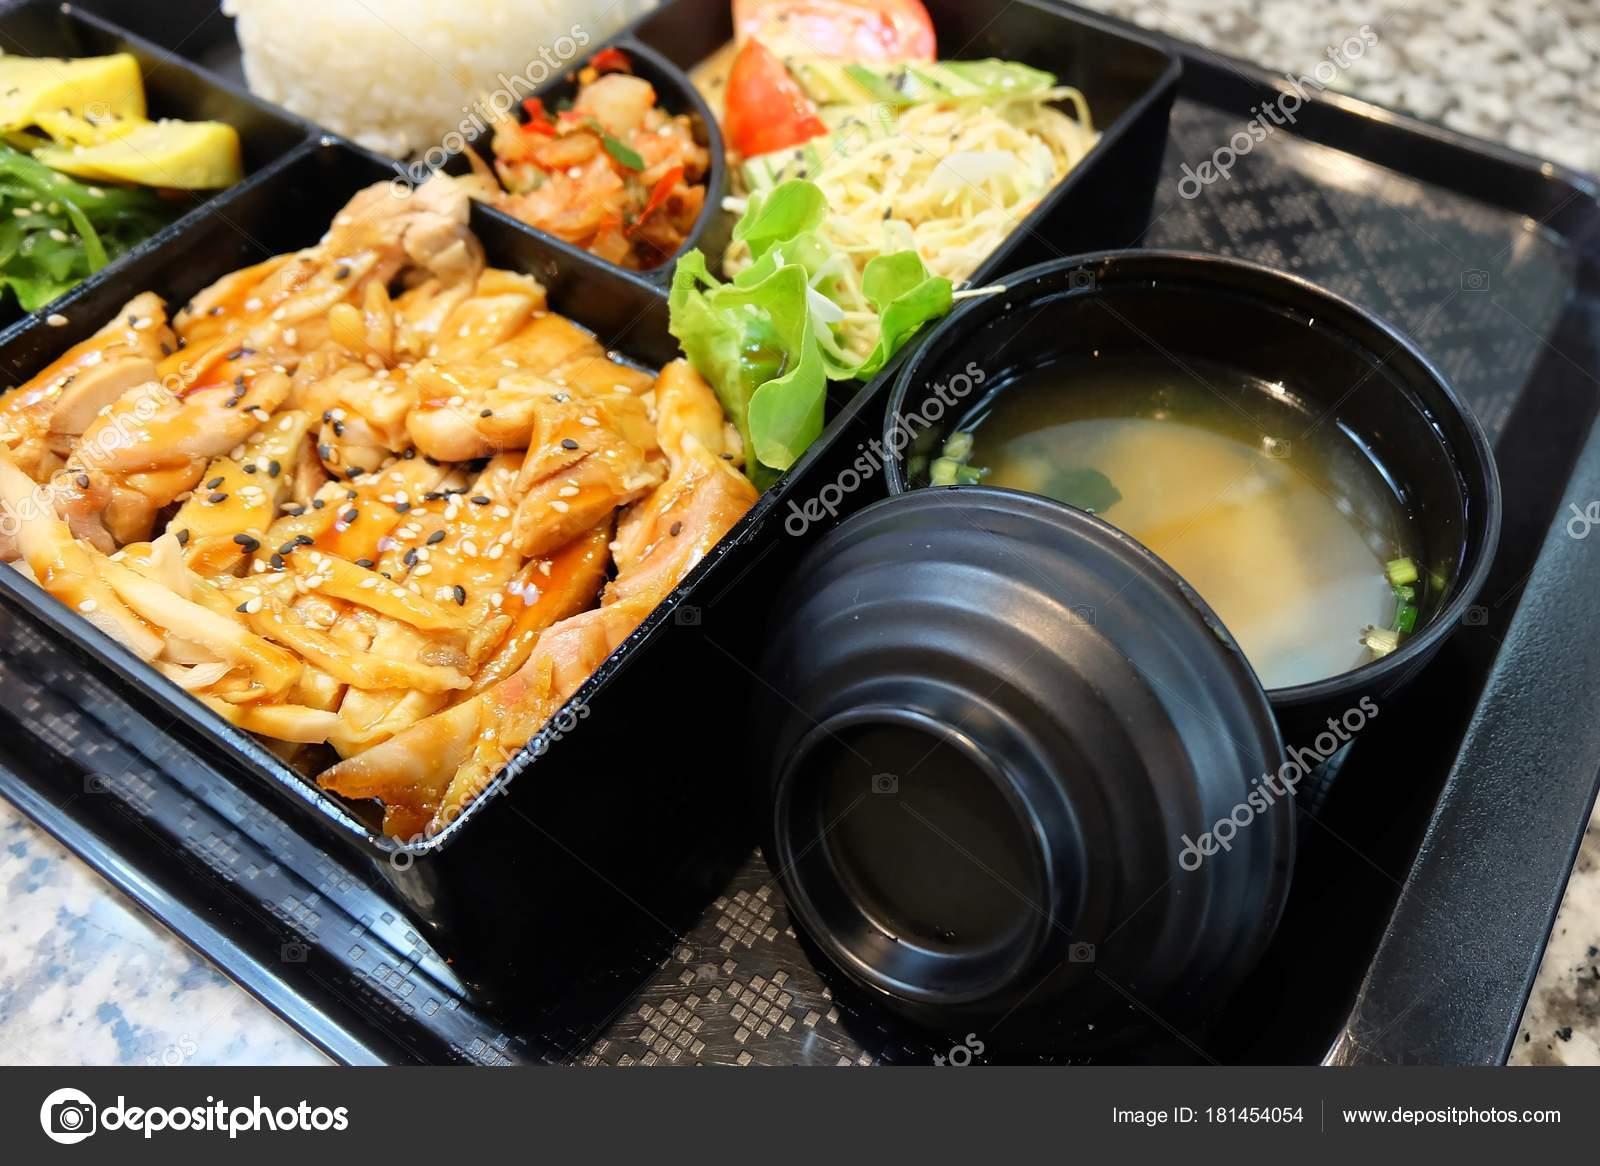 Traditional Japan Cuisine Bento Box Multi Layered Teriyaki Chicken Stock Photo